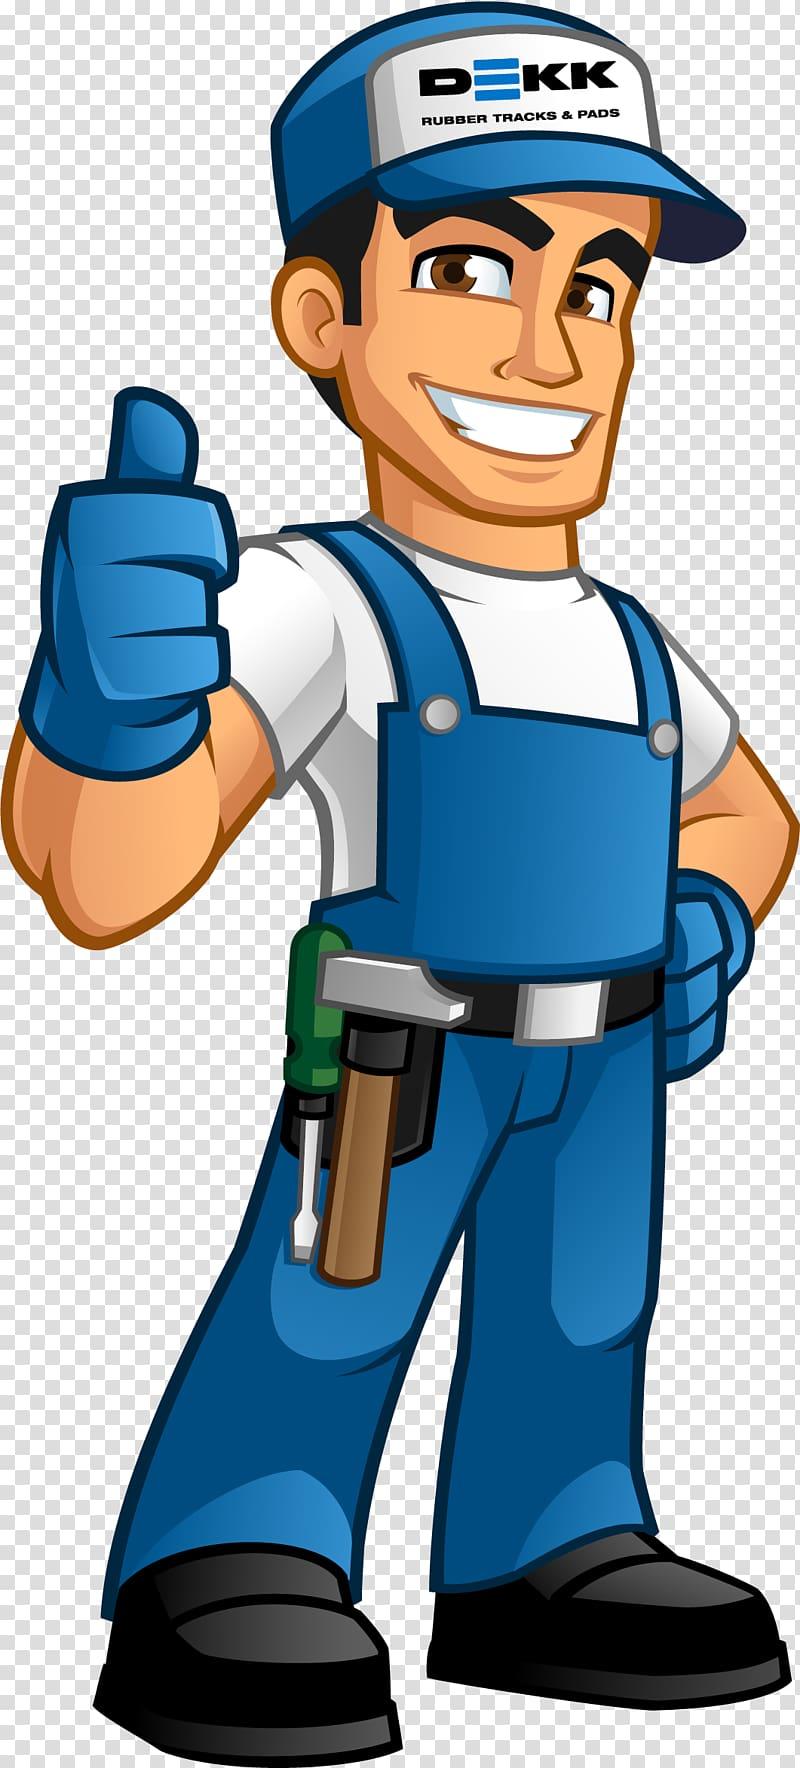 Handy man clipart image free download Handyman illustration, Handyman , worker transparent background PNG ... image free download